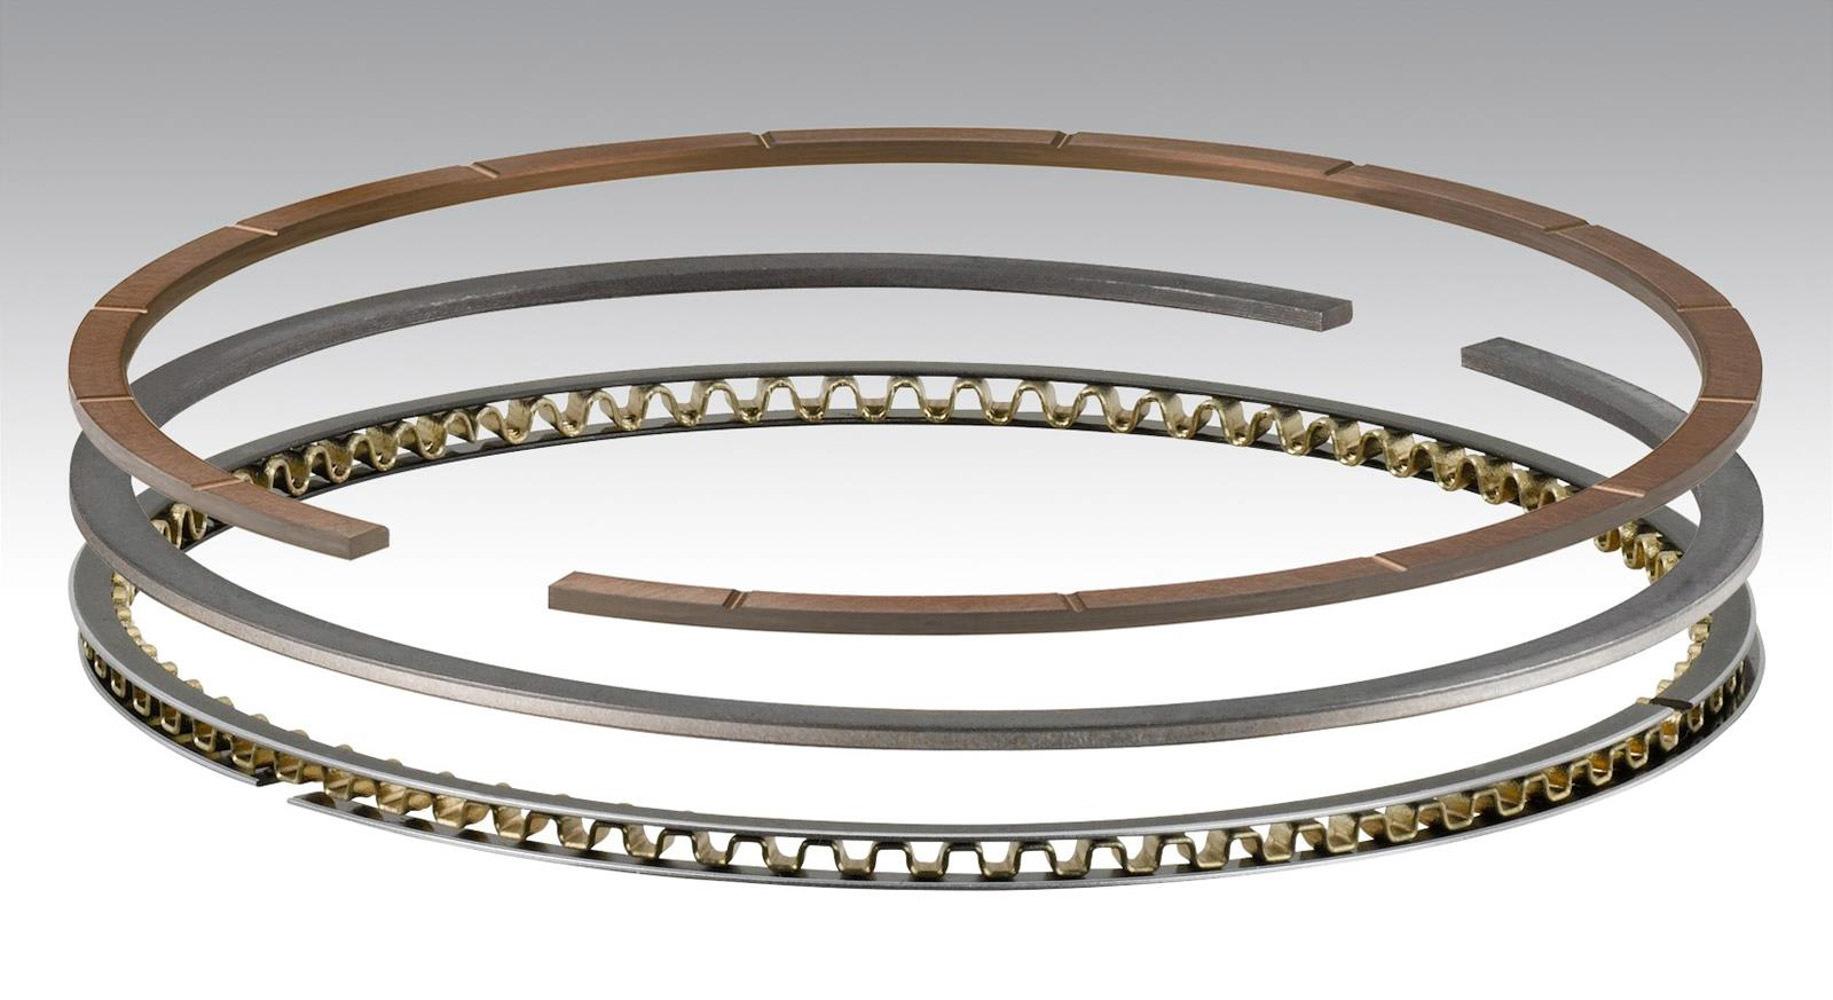 Total Seal CR3690GP-5 GP Piston Ring Set 4.005 Bore 1/16 1/16 3/16